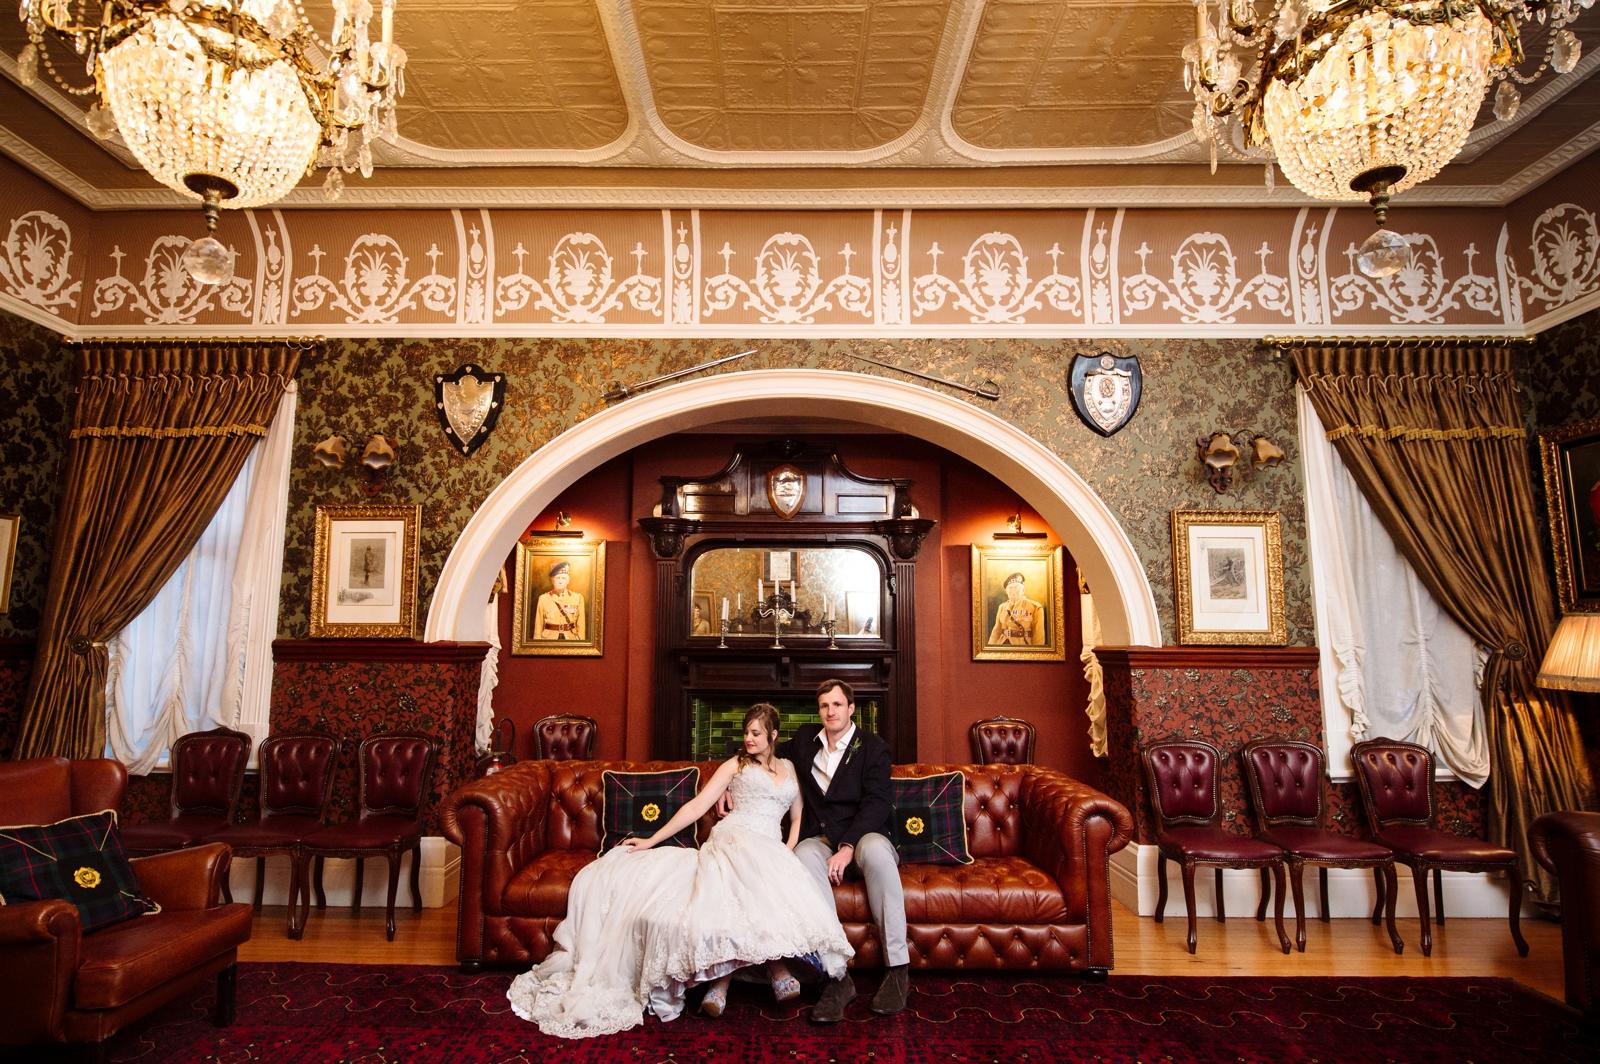 Royal Bride and Groom